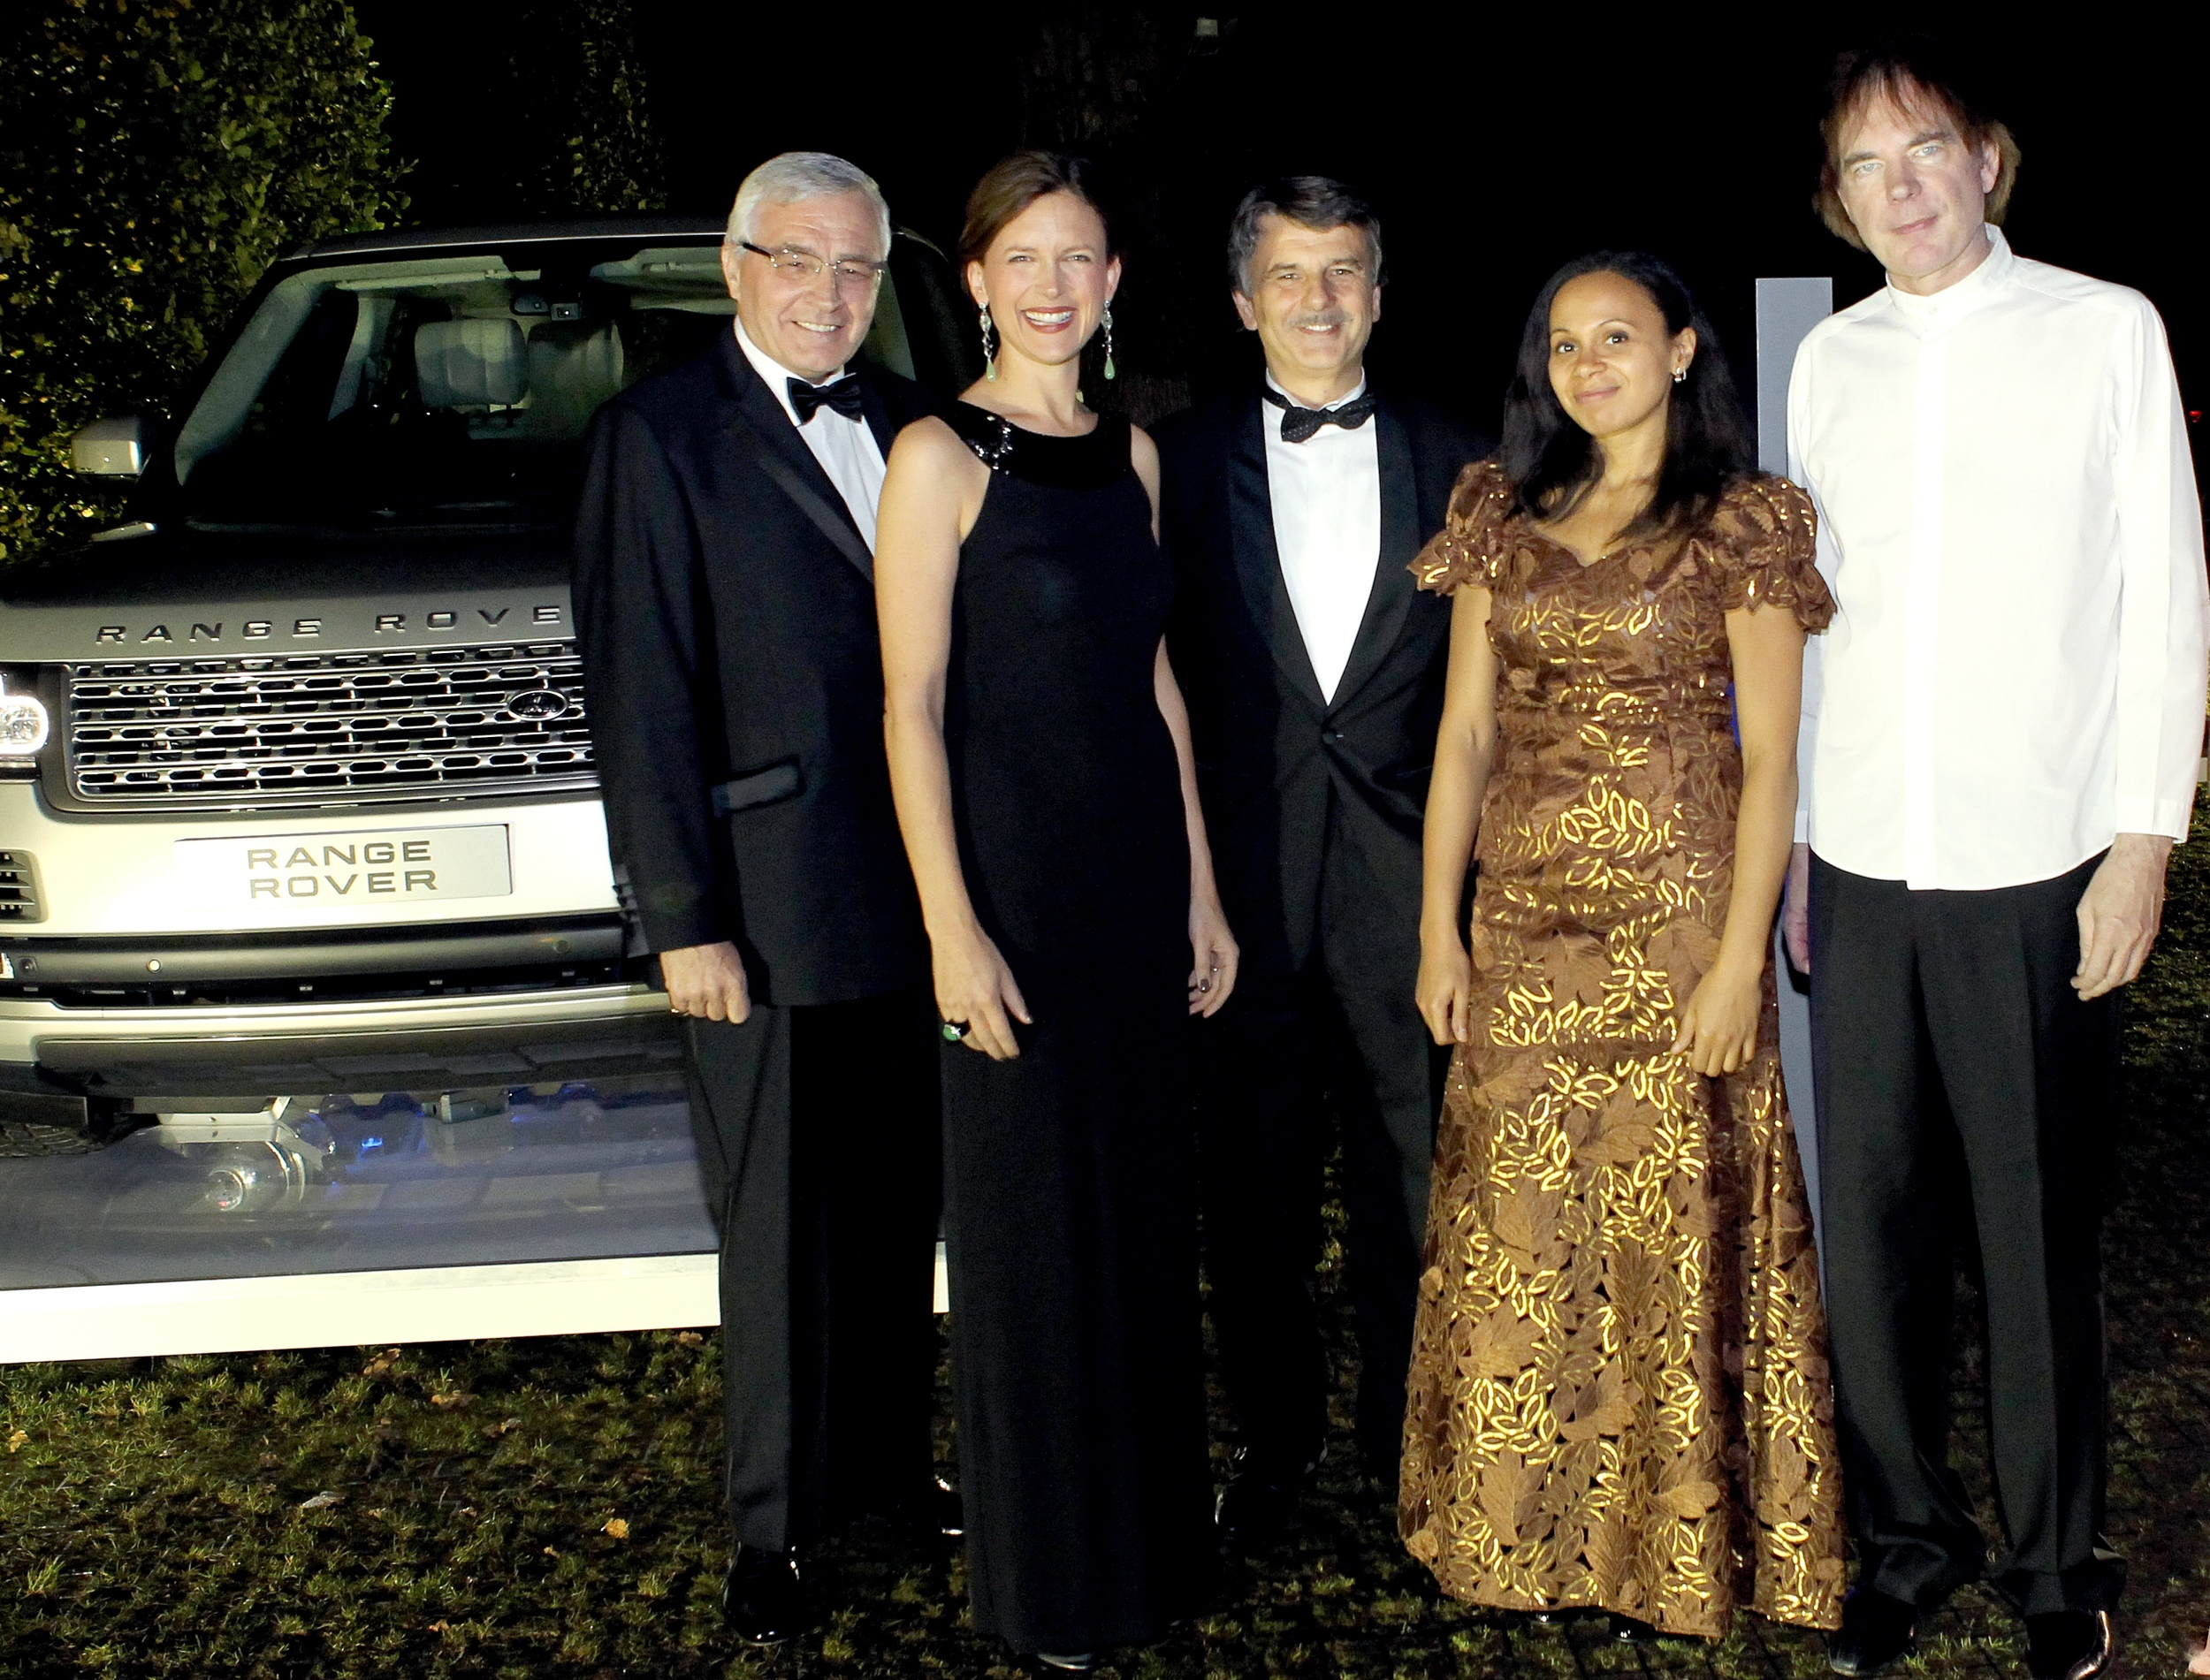 Highgrove for the Prince's Trust - Julian Lloyd Webber, Rebeca Omordia, Katie Derham and Range Rover representatives